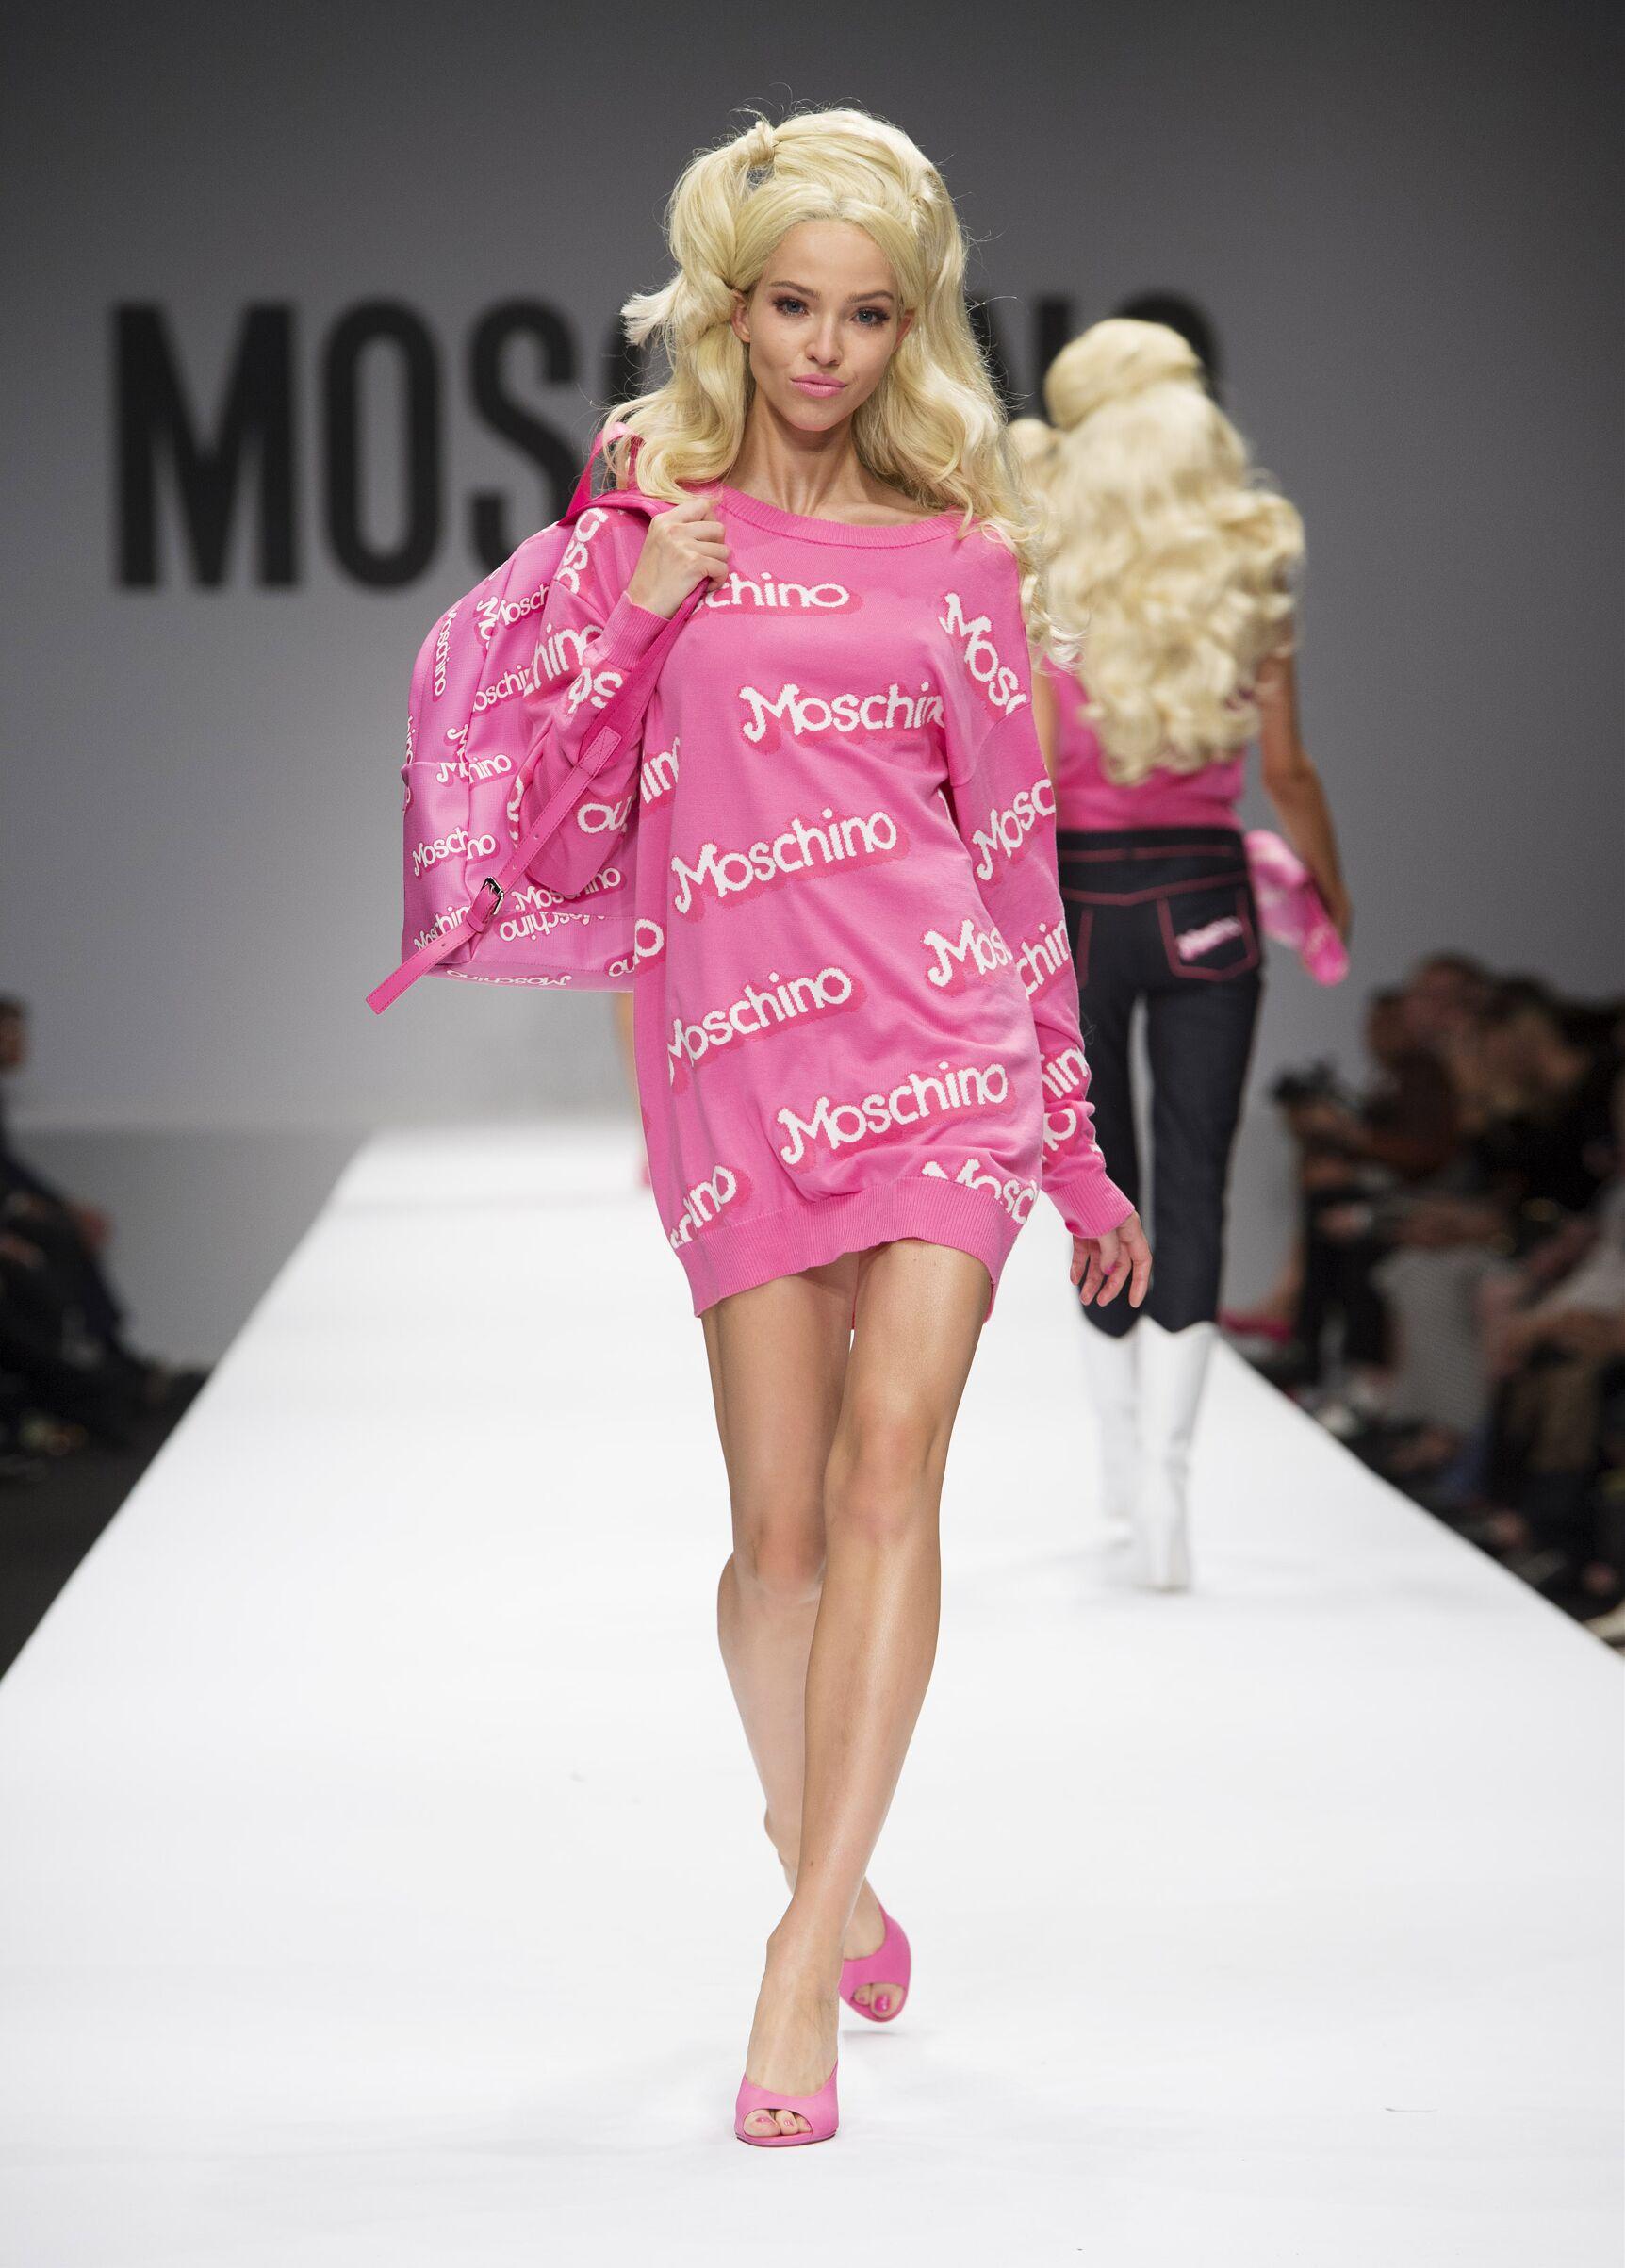 Spring Summer 2015 Fashion Model Moschino Barbie Look